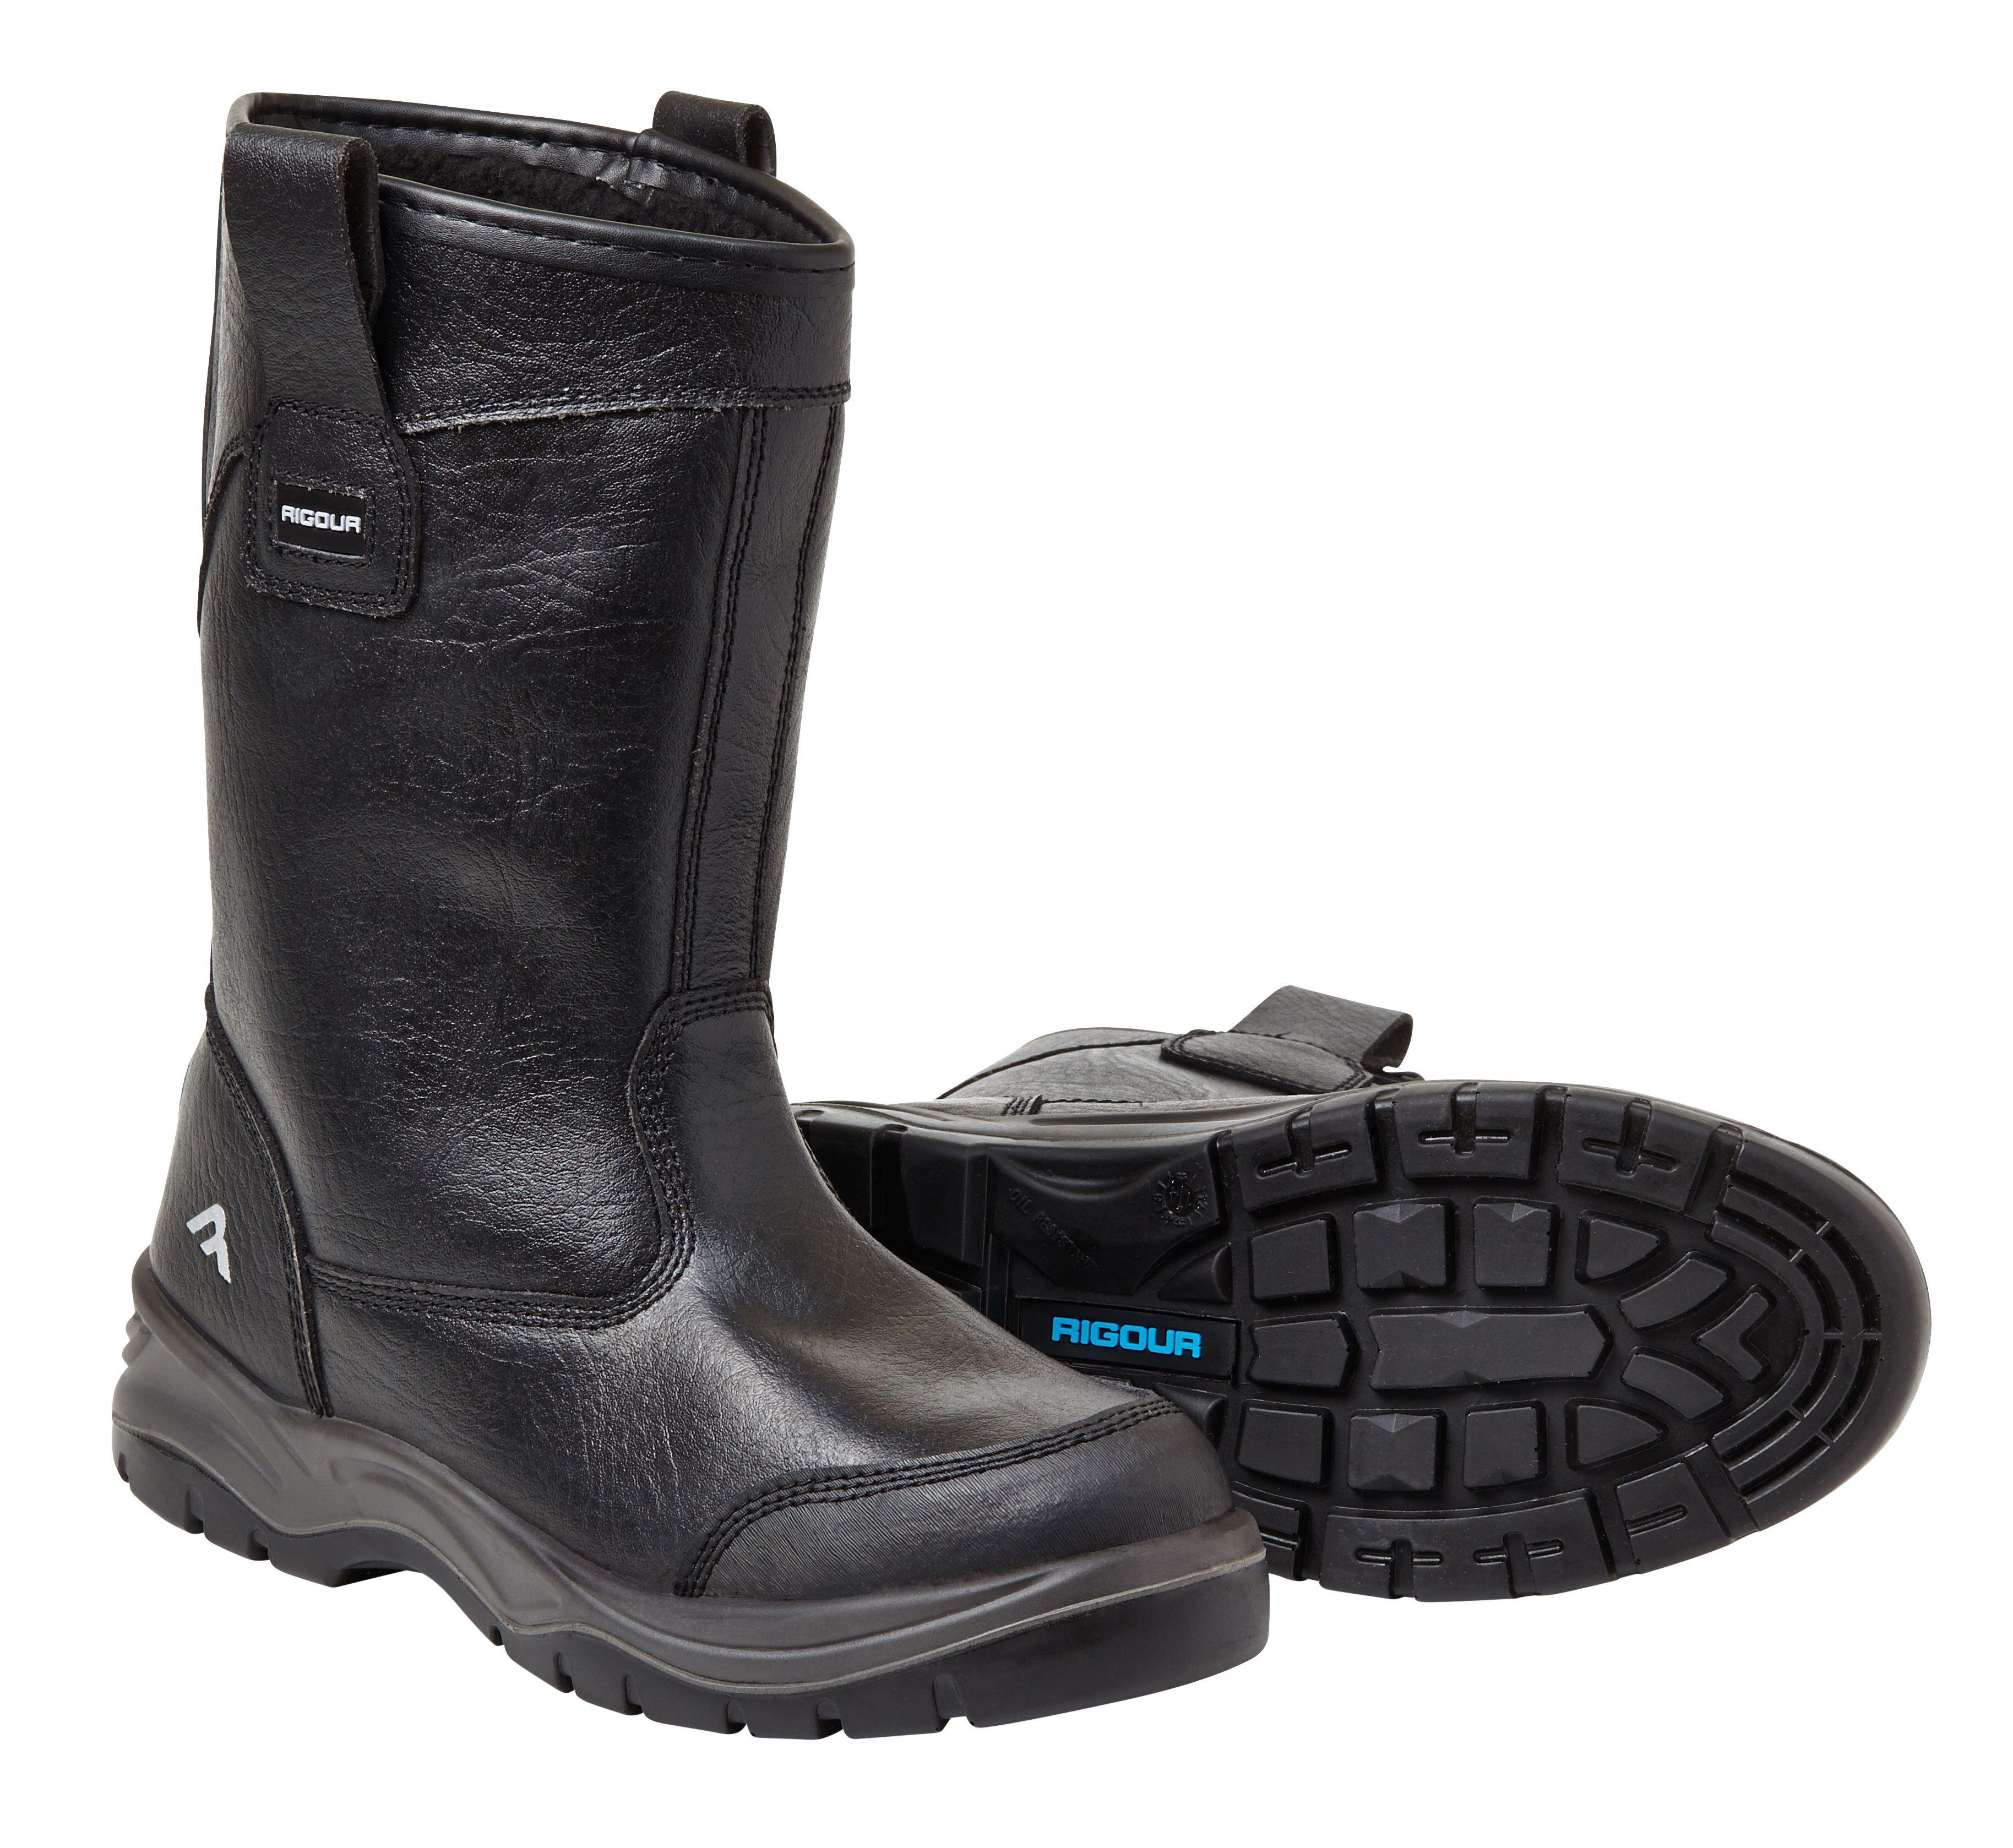 Rigour Black Rigger Boots, Size 11